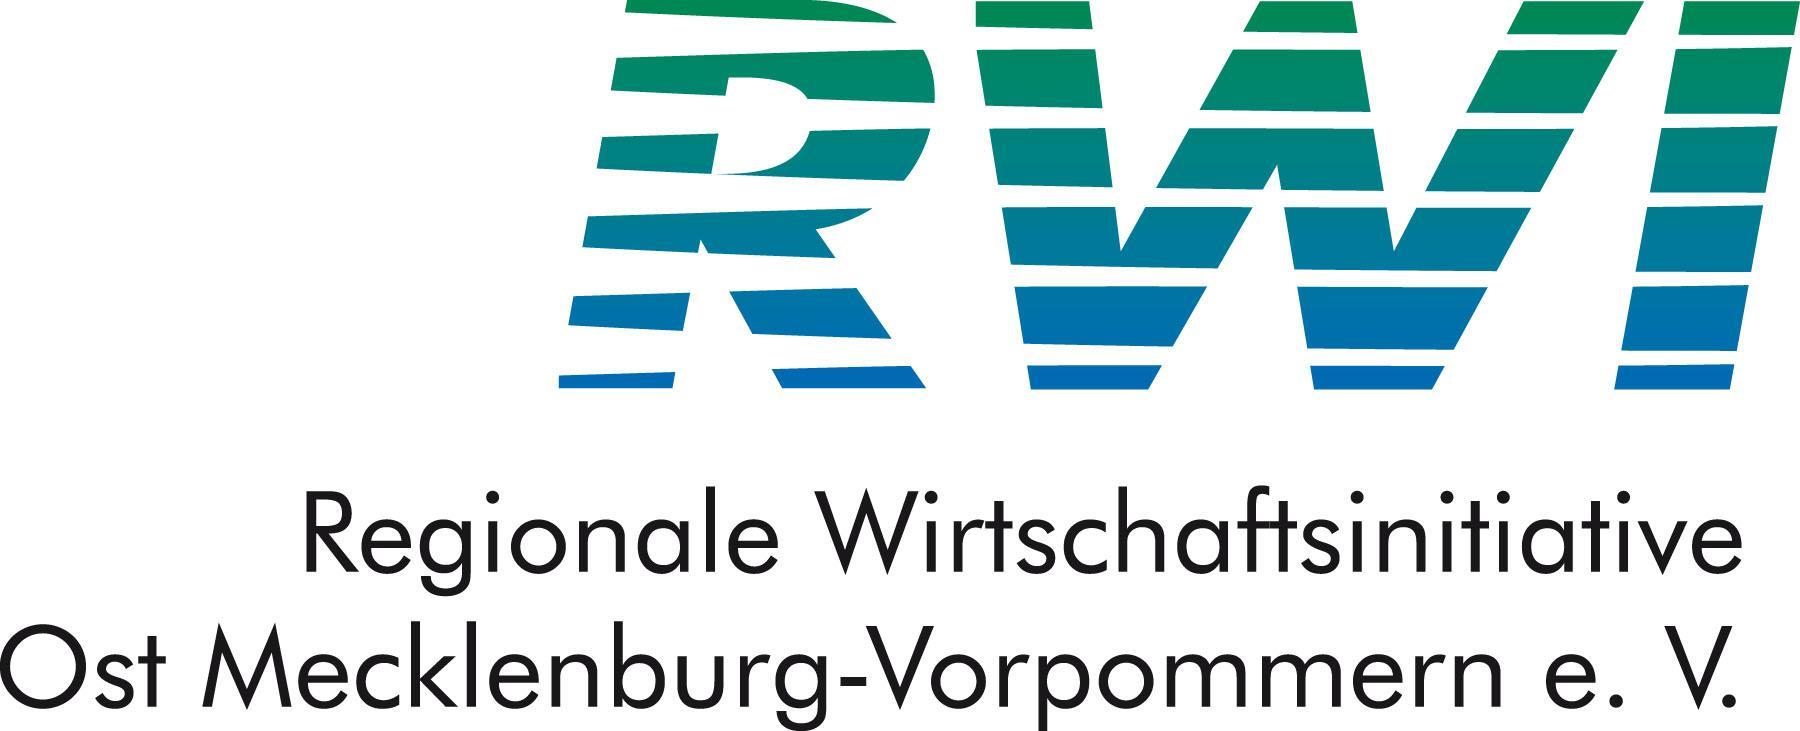 RWI Logo